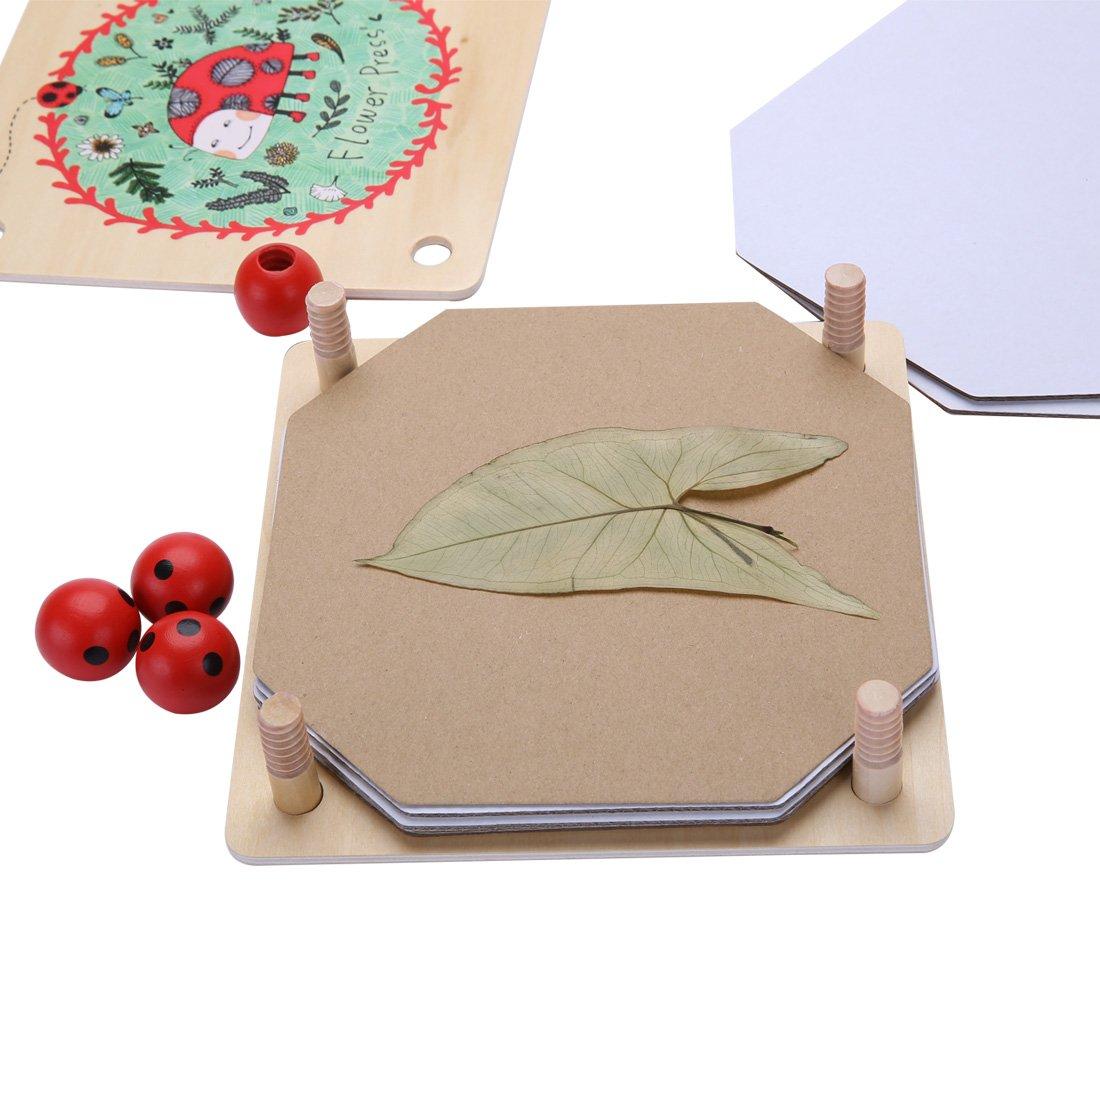 Mideer Flower Press Kit Art Craft Nature Press